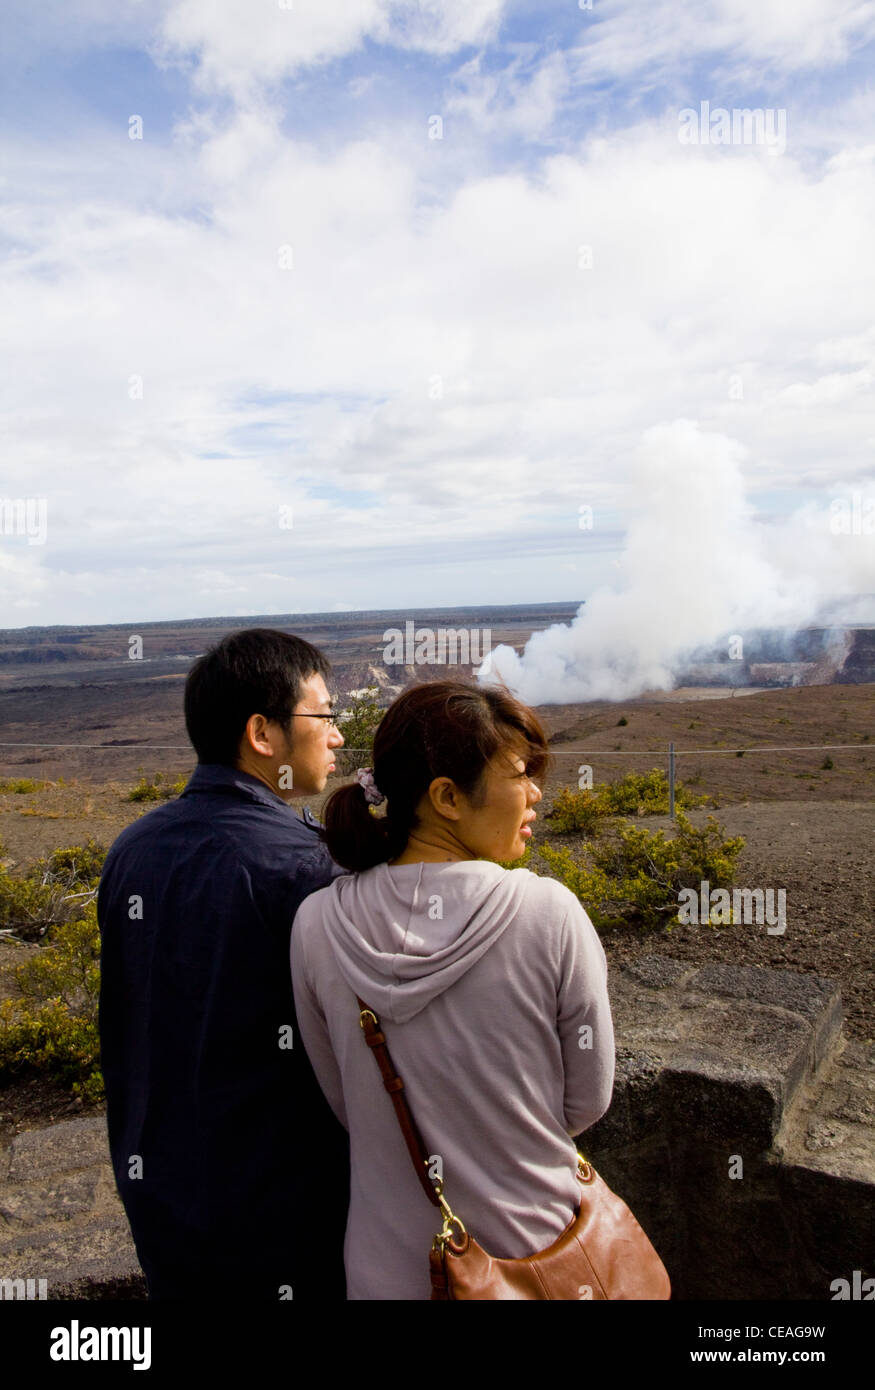 Volcanic gases billowing from Halema'uma'u Crater, Kilauea Overlook, Kilauea's summit caldera, Big Island, - Stock Image